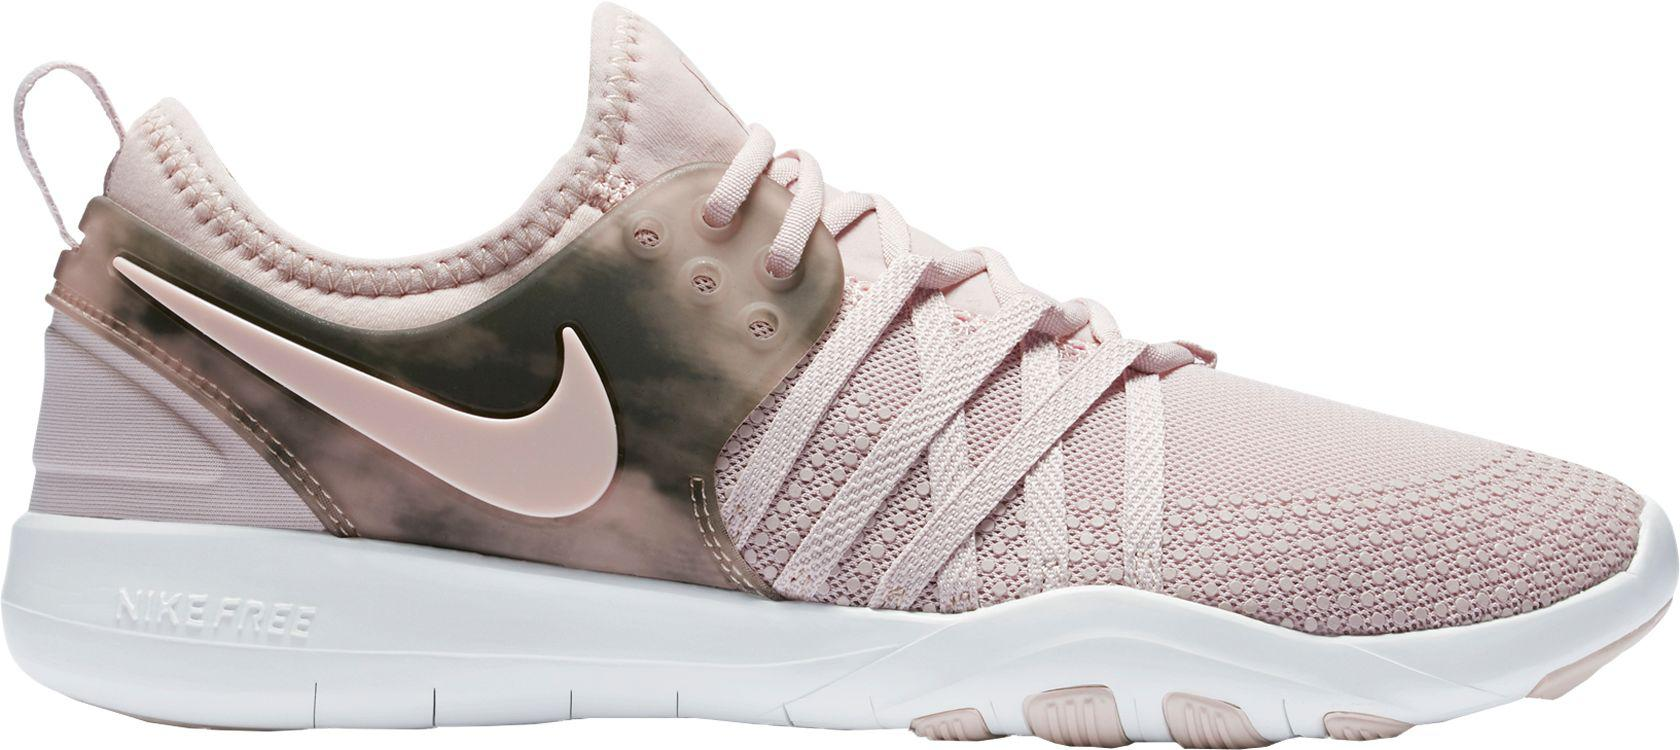 Nike Free Tr 7 Métalliques Bas-tops & Chaussures TaaqrupqS